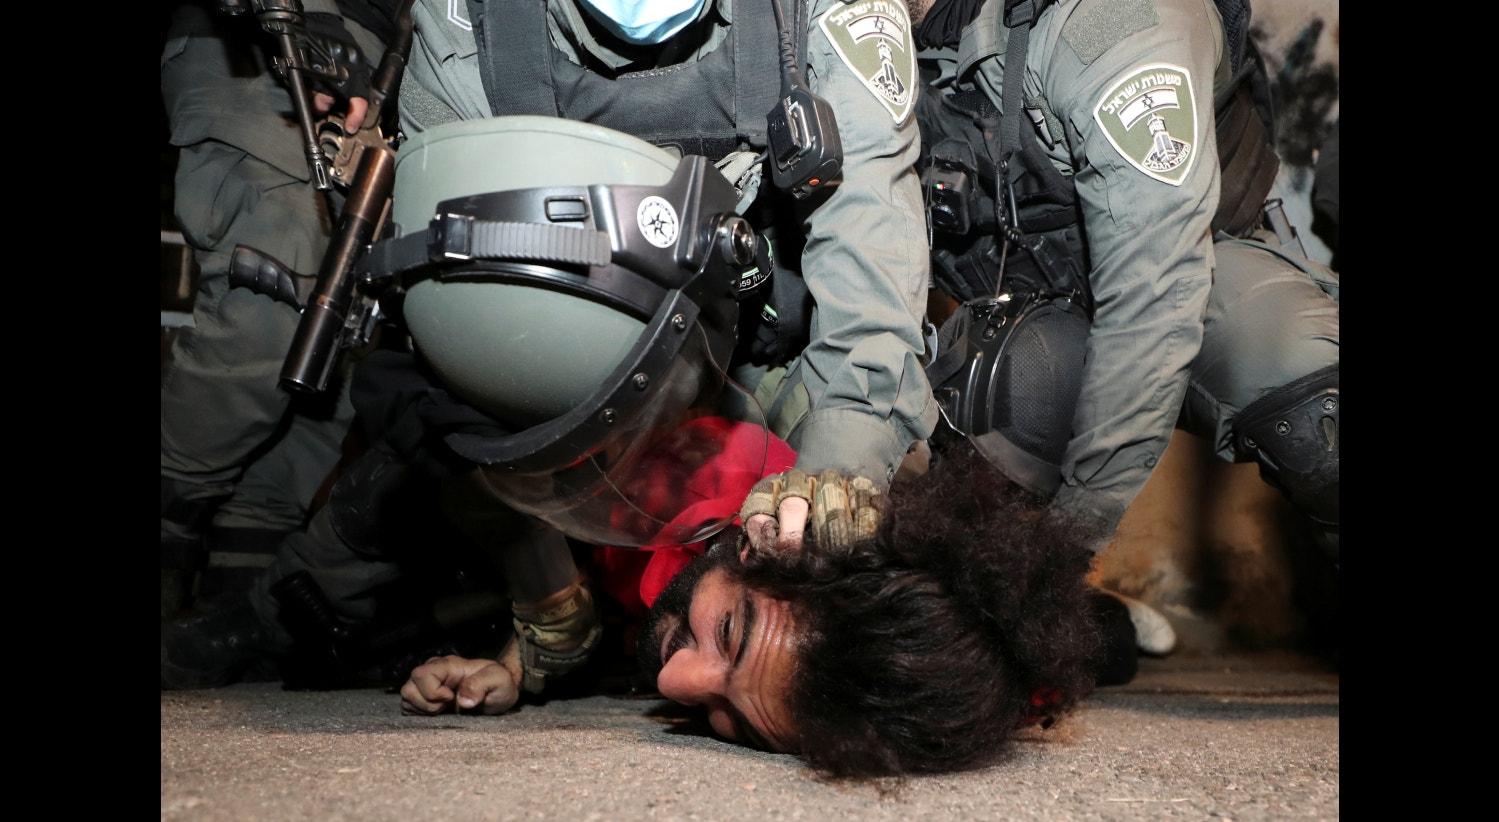 Israel. Confrontos em Jerusalém. Palestiniano detido por militares israelitas | Ammar Awad - Reuters